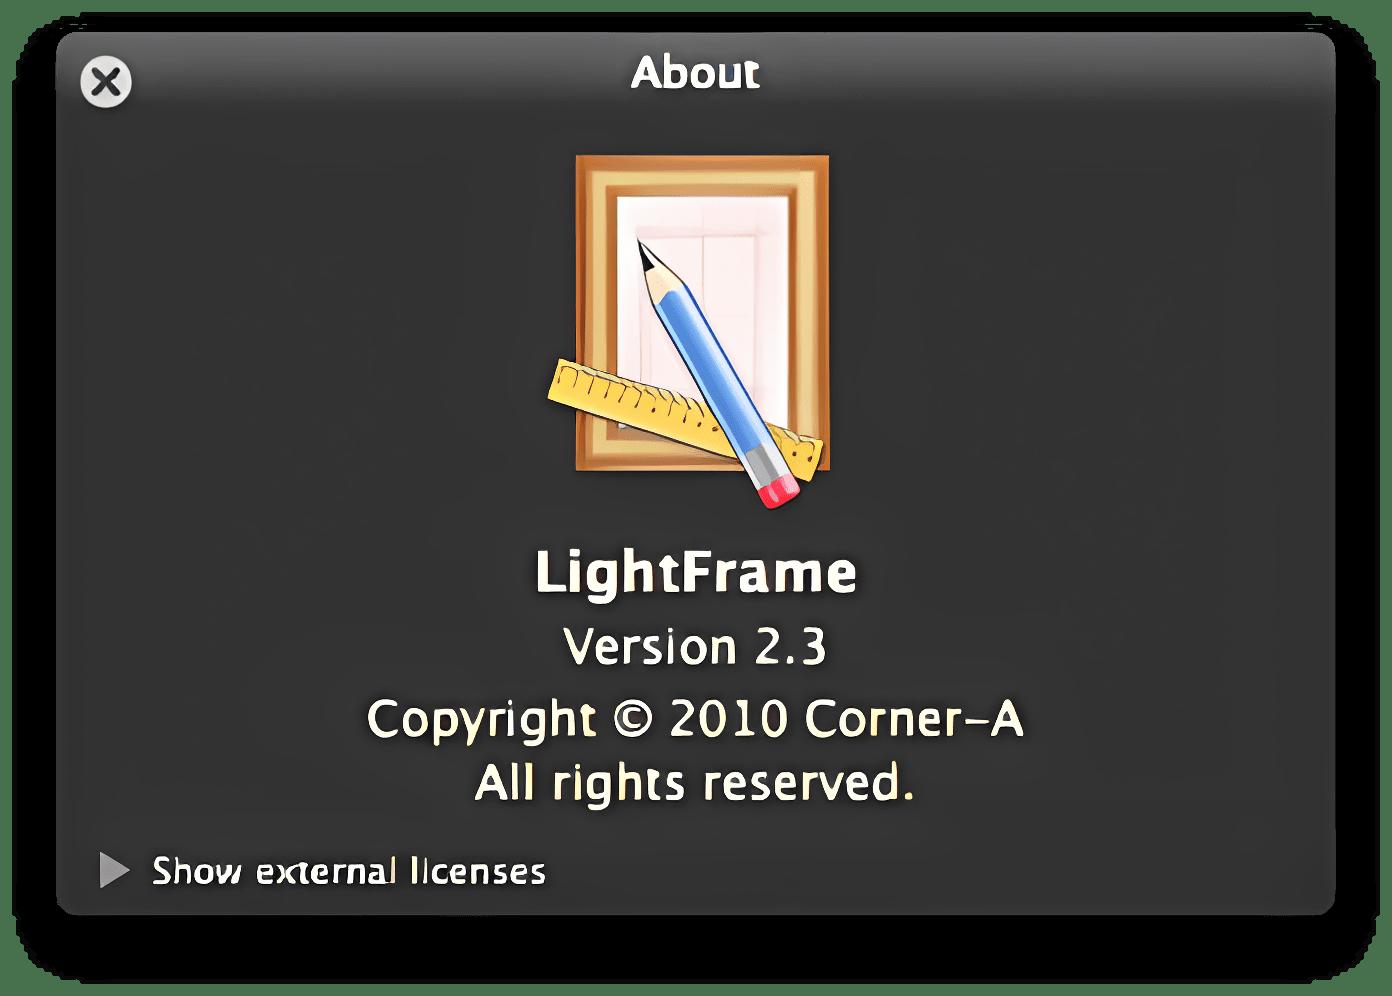 LightFrame